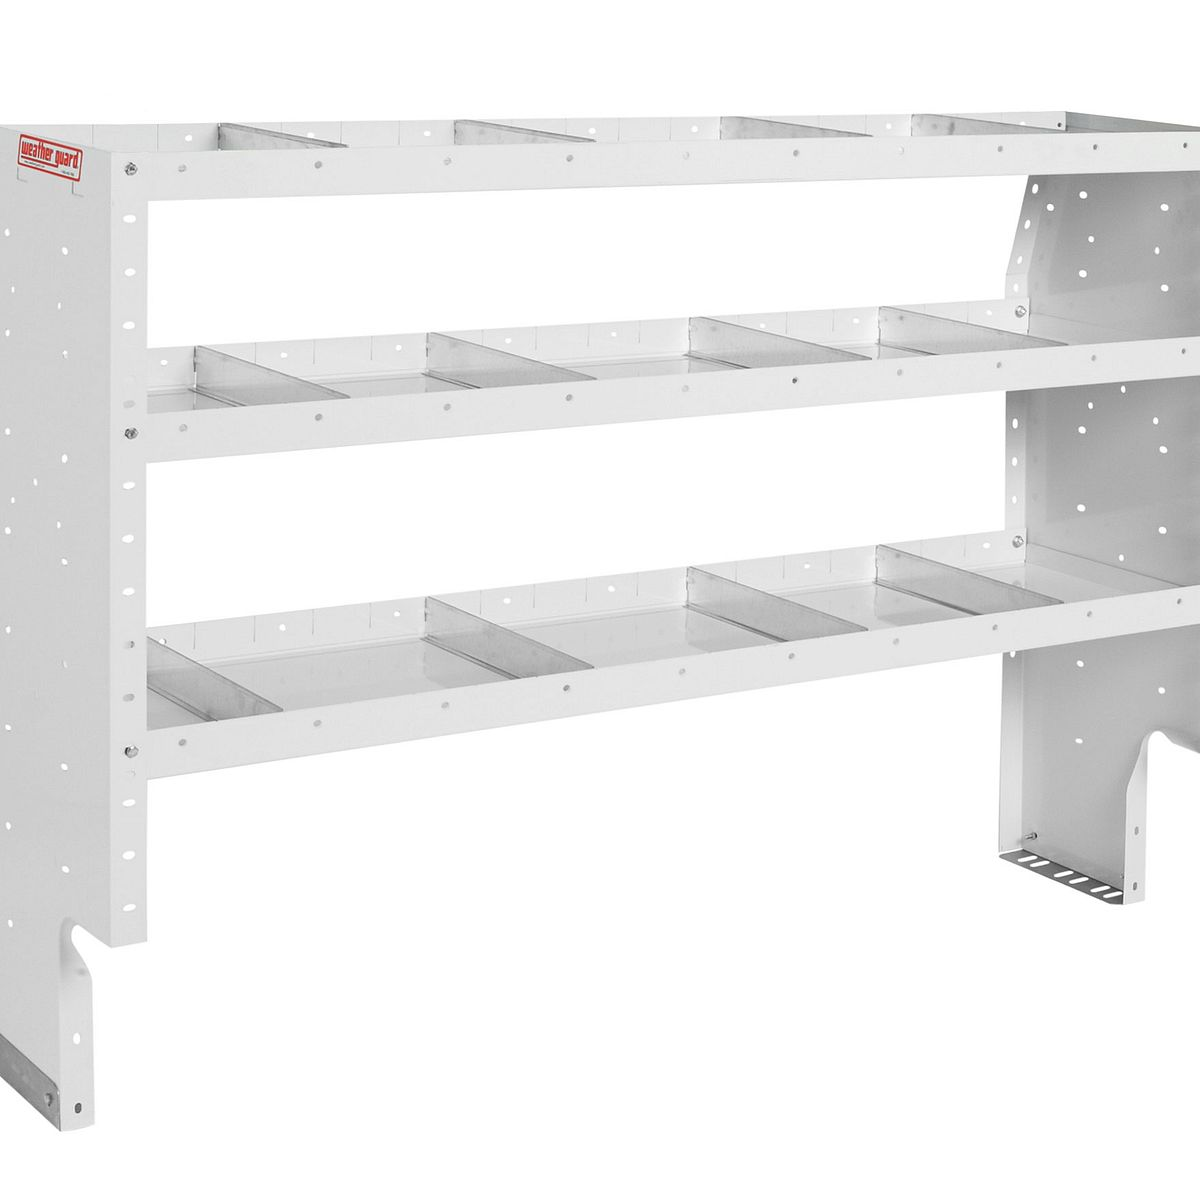 Weatherguard Accessory Shelf 60in x 16in